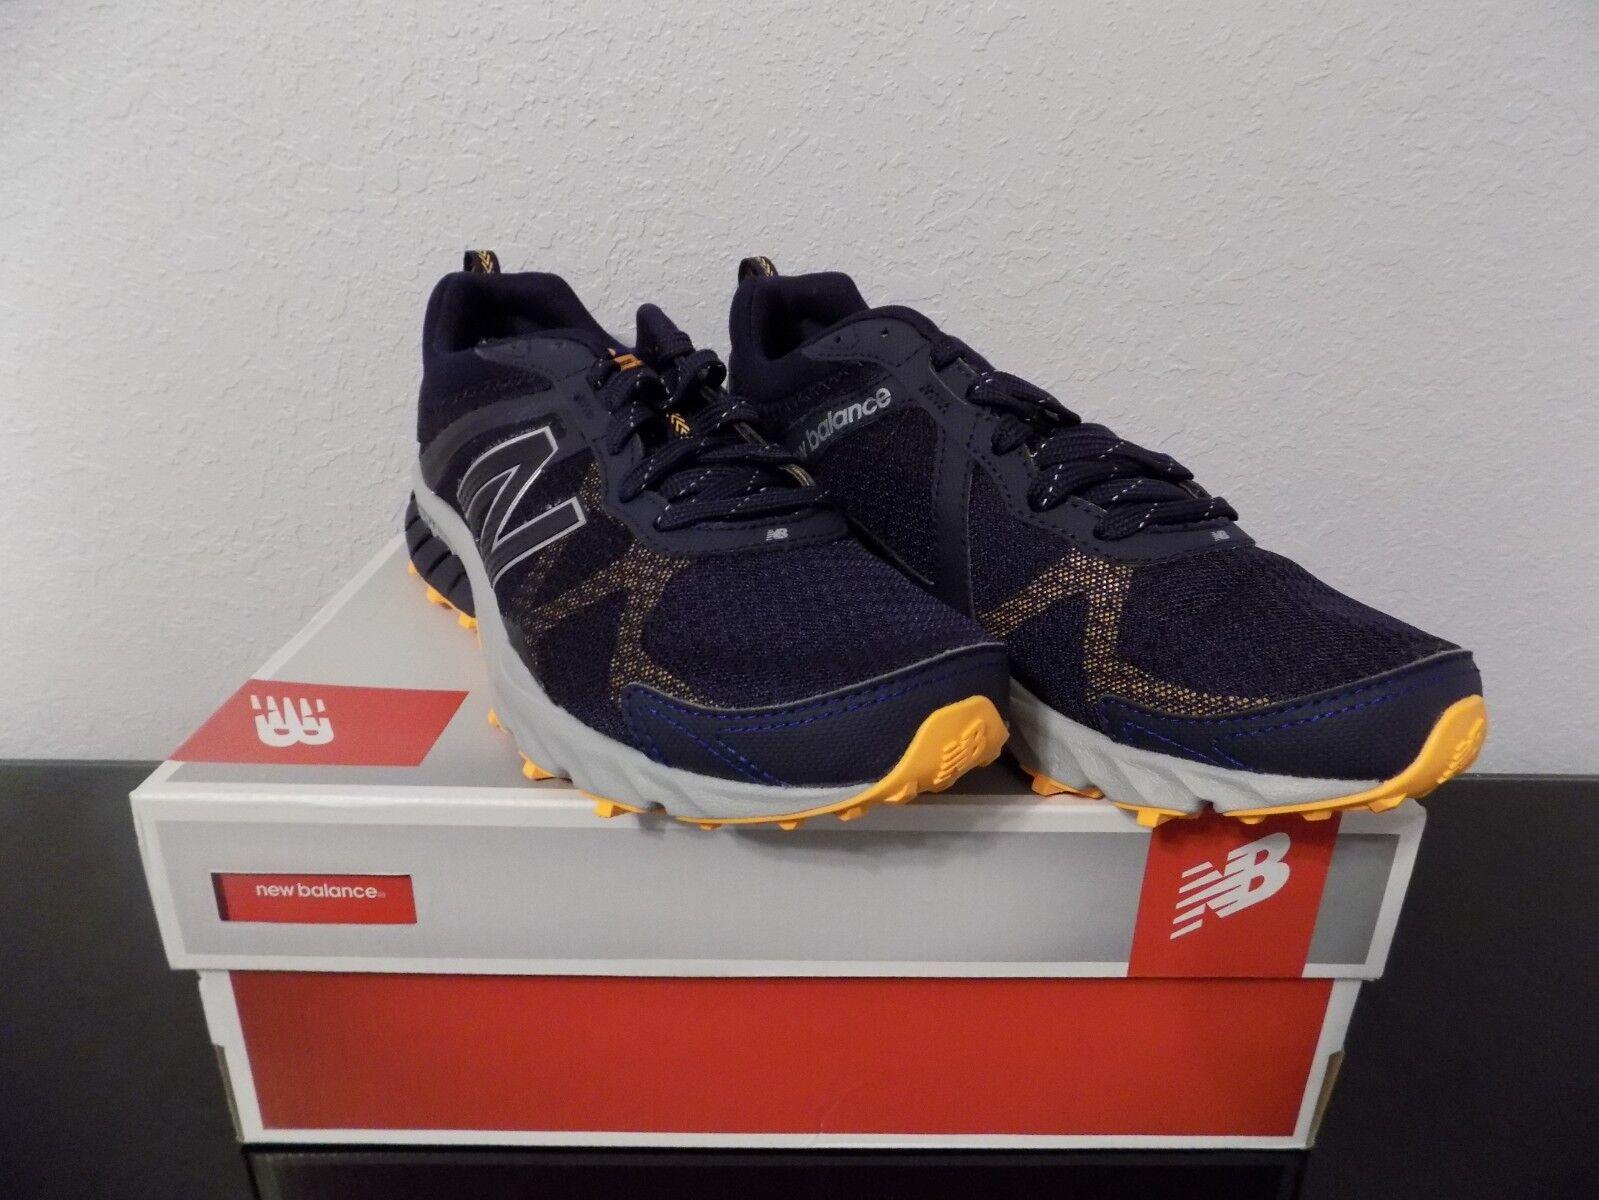 a6e7f26b4a New Balance Mens Mt610RN5 Navy shoes Size 10 NIB running shoes med Running  nunpfj3507-Athletic Shoes